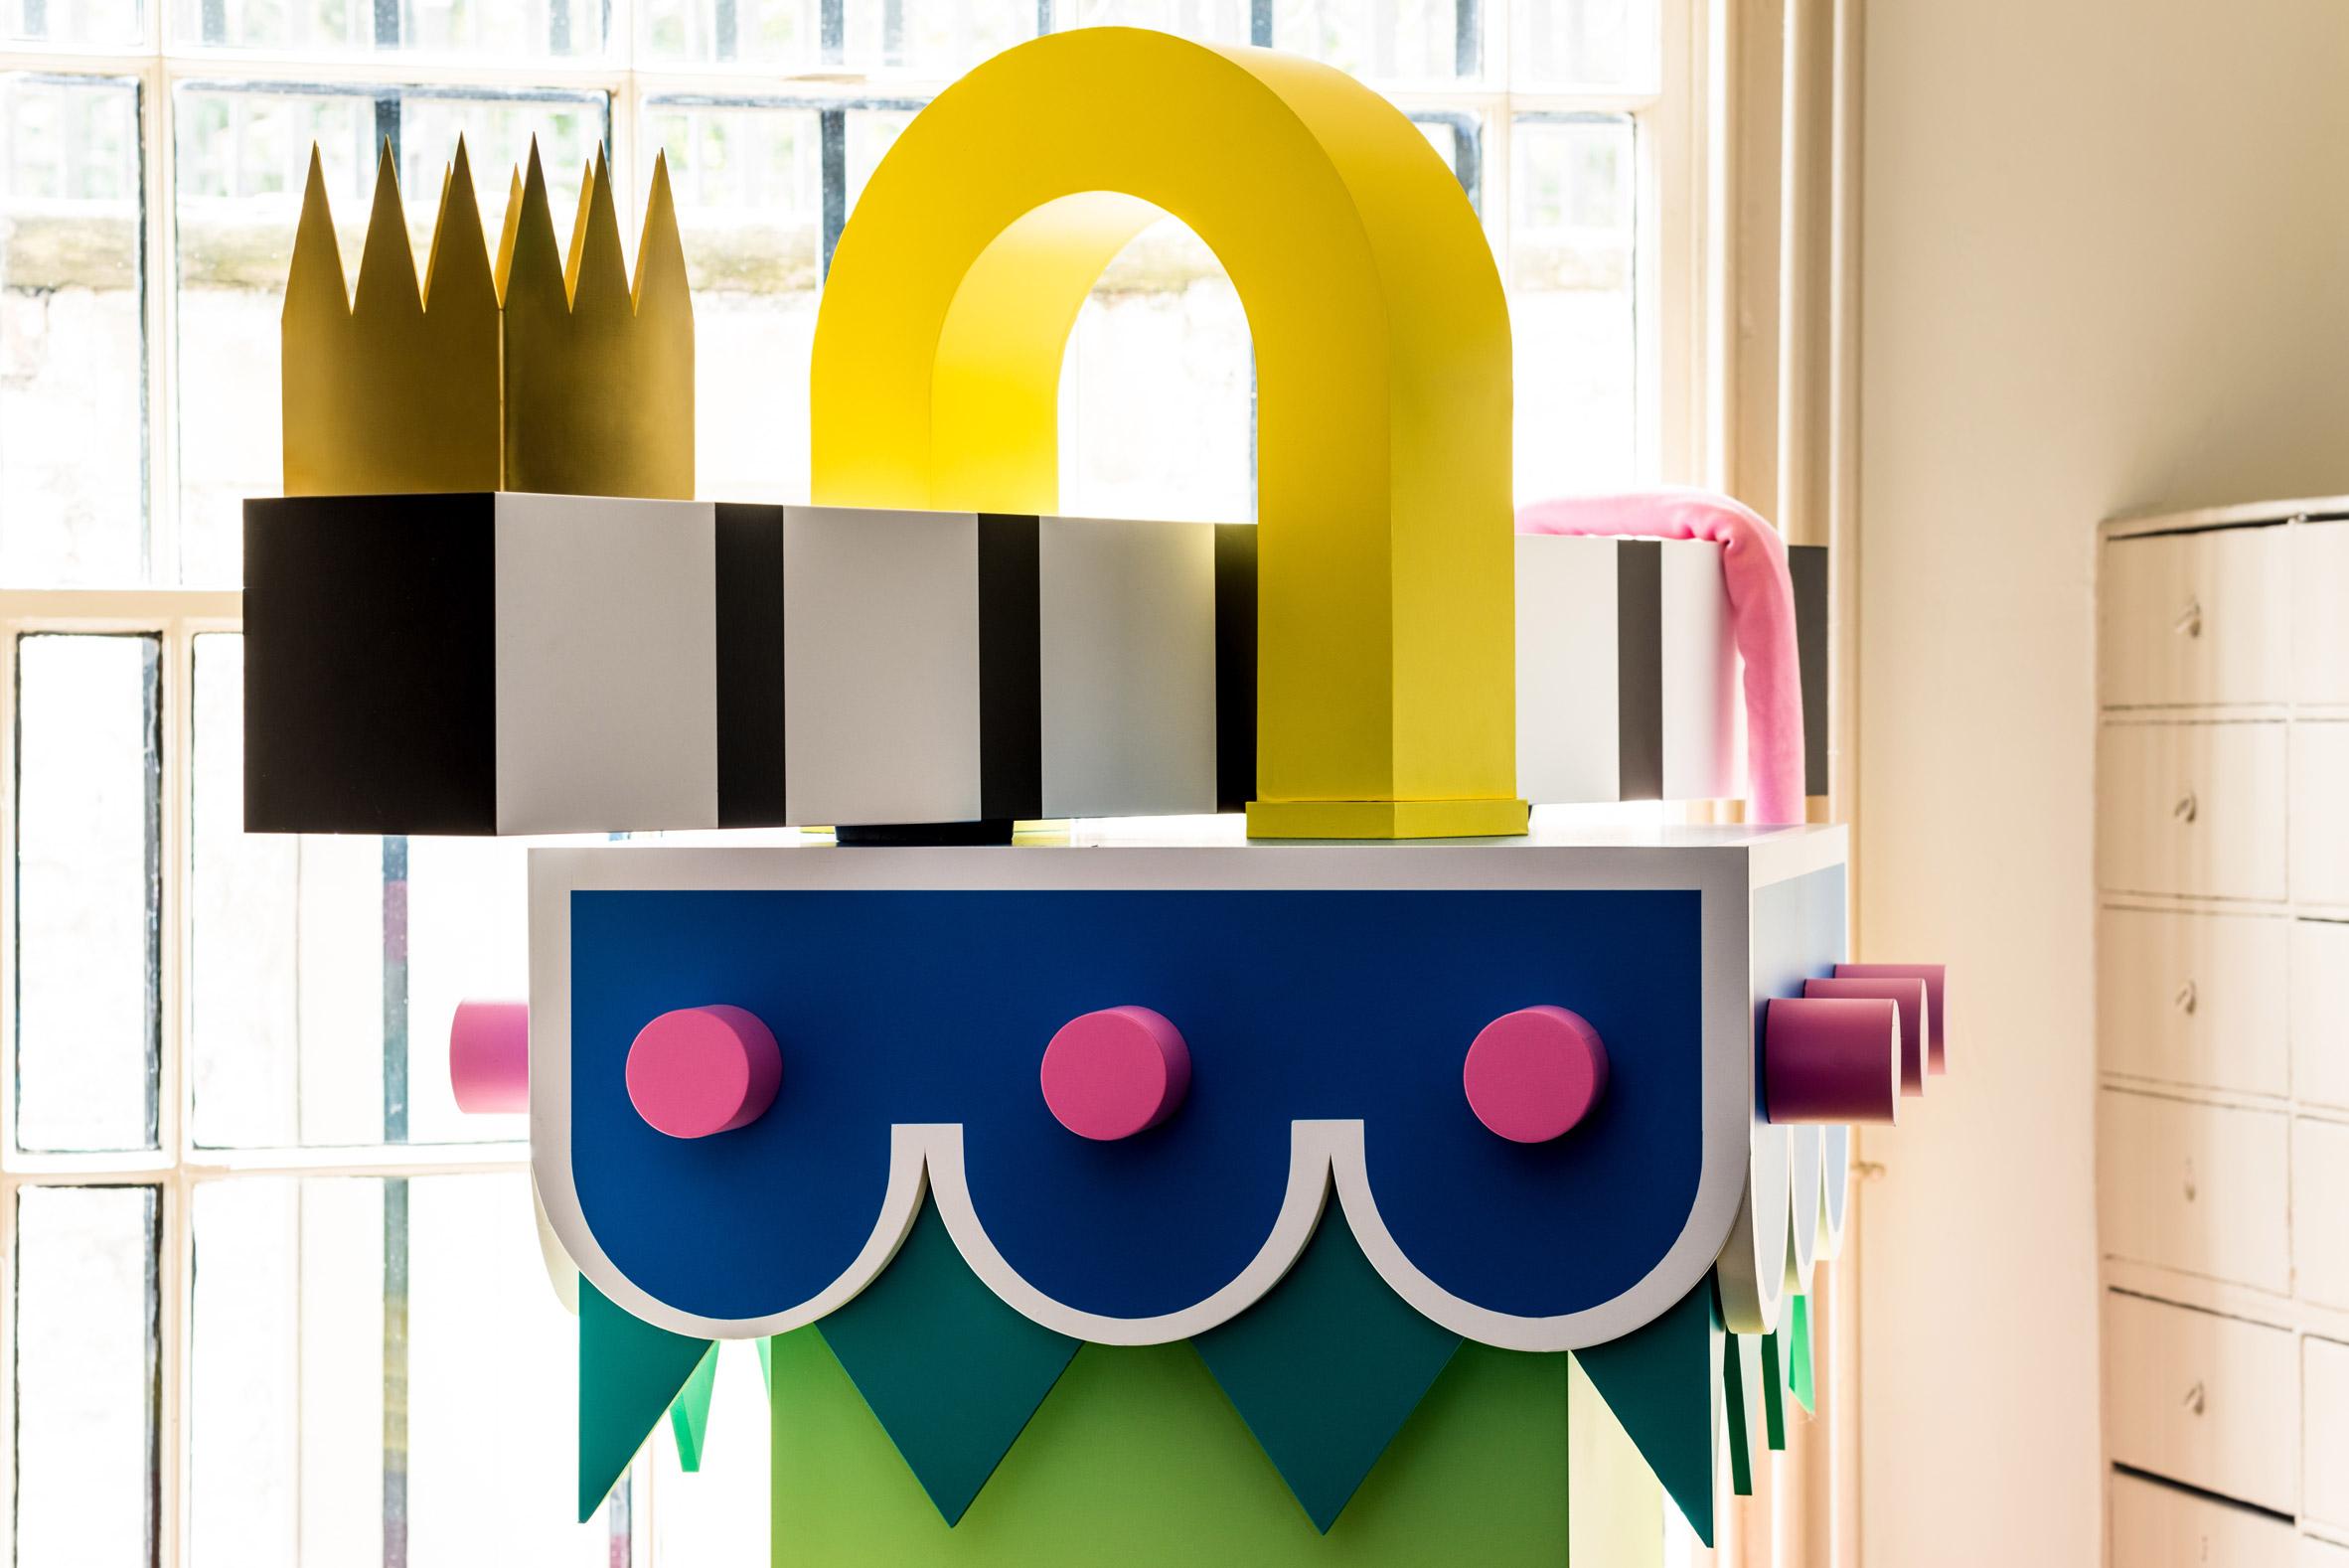 john-soane-architectural-characters-installation-london-uk_dezeen_2364_col_0.jpg